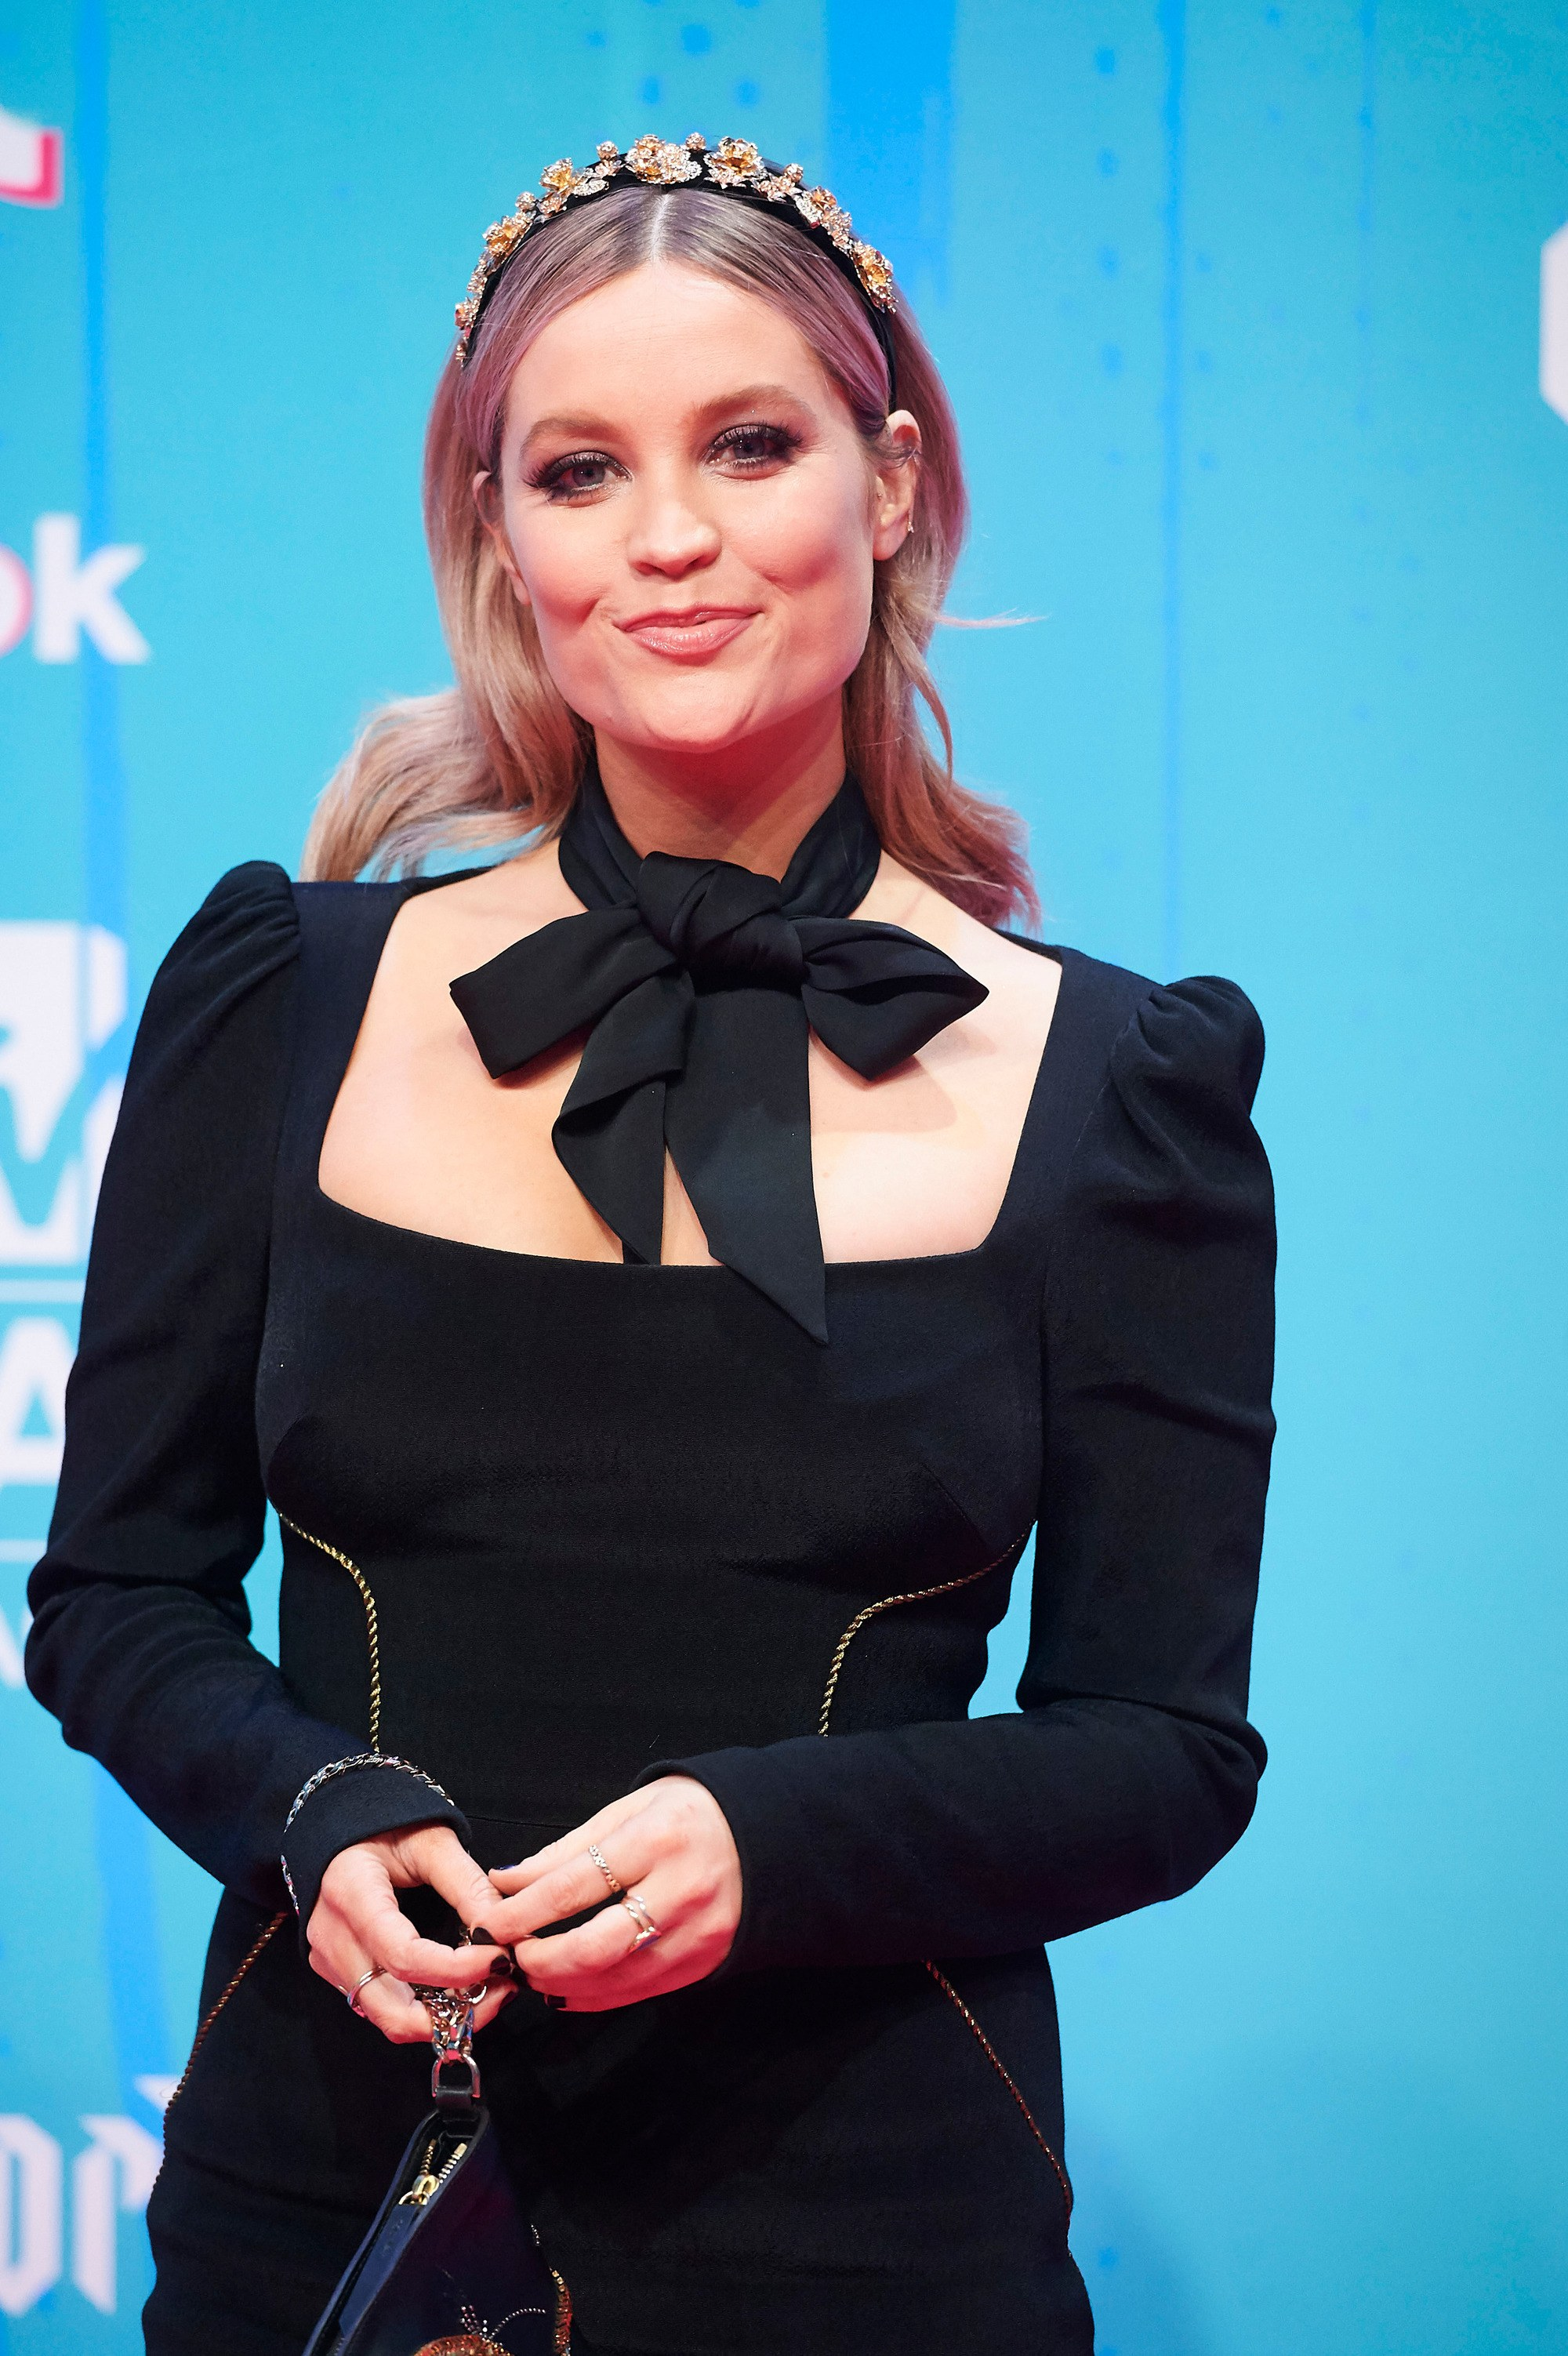 MTV EMAs 2018: MTV presenter Laura Whitmore at the 2018 EMAs wearing a jeweled headband and black velvet dress